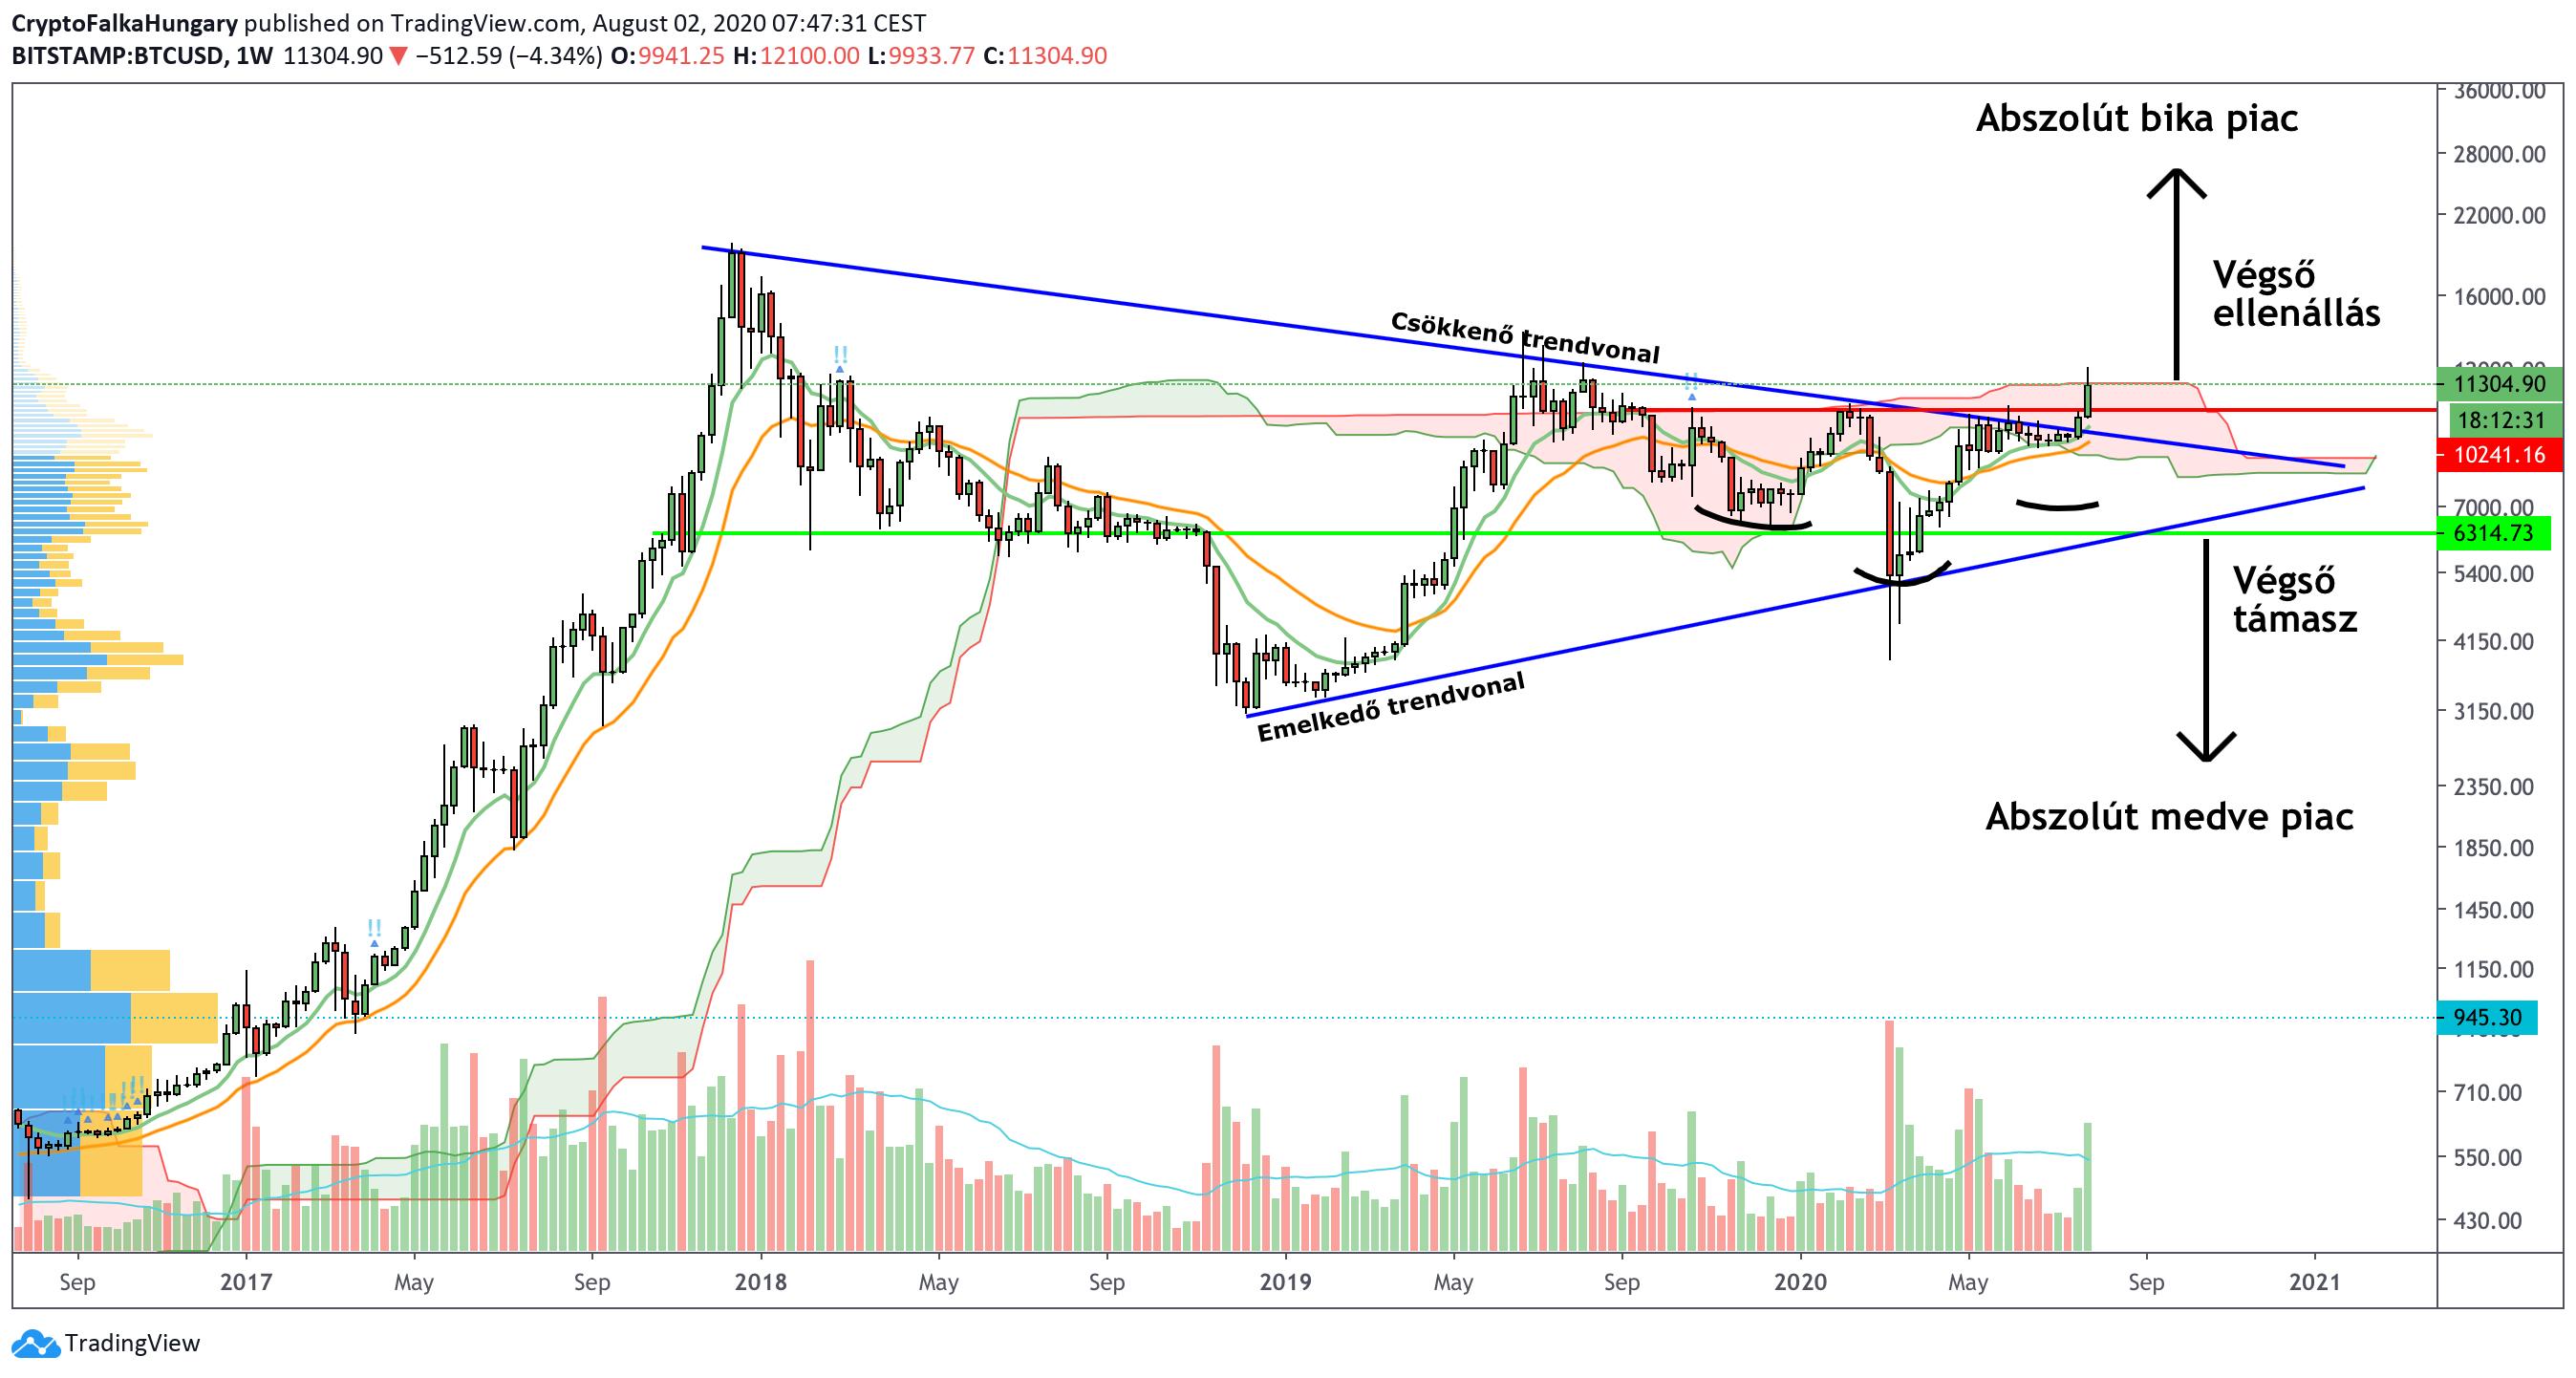 Bitcoin árfolyama heti nézeten I Cryptofalka